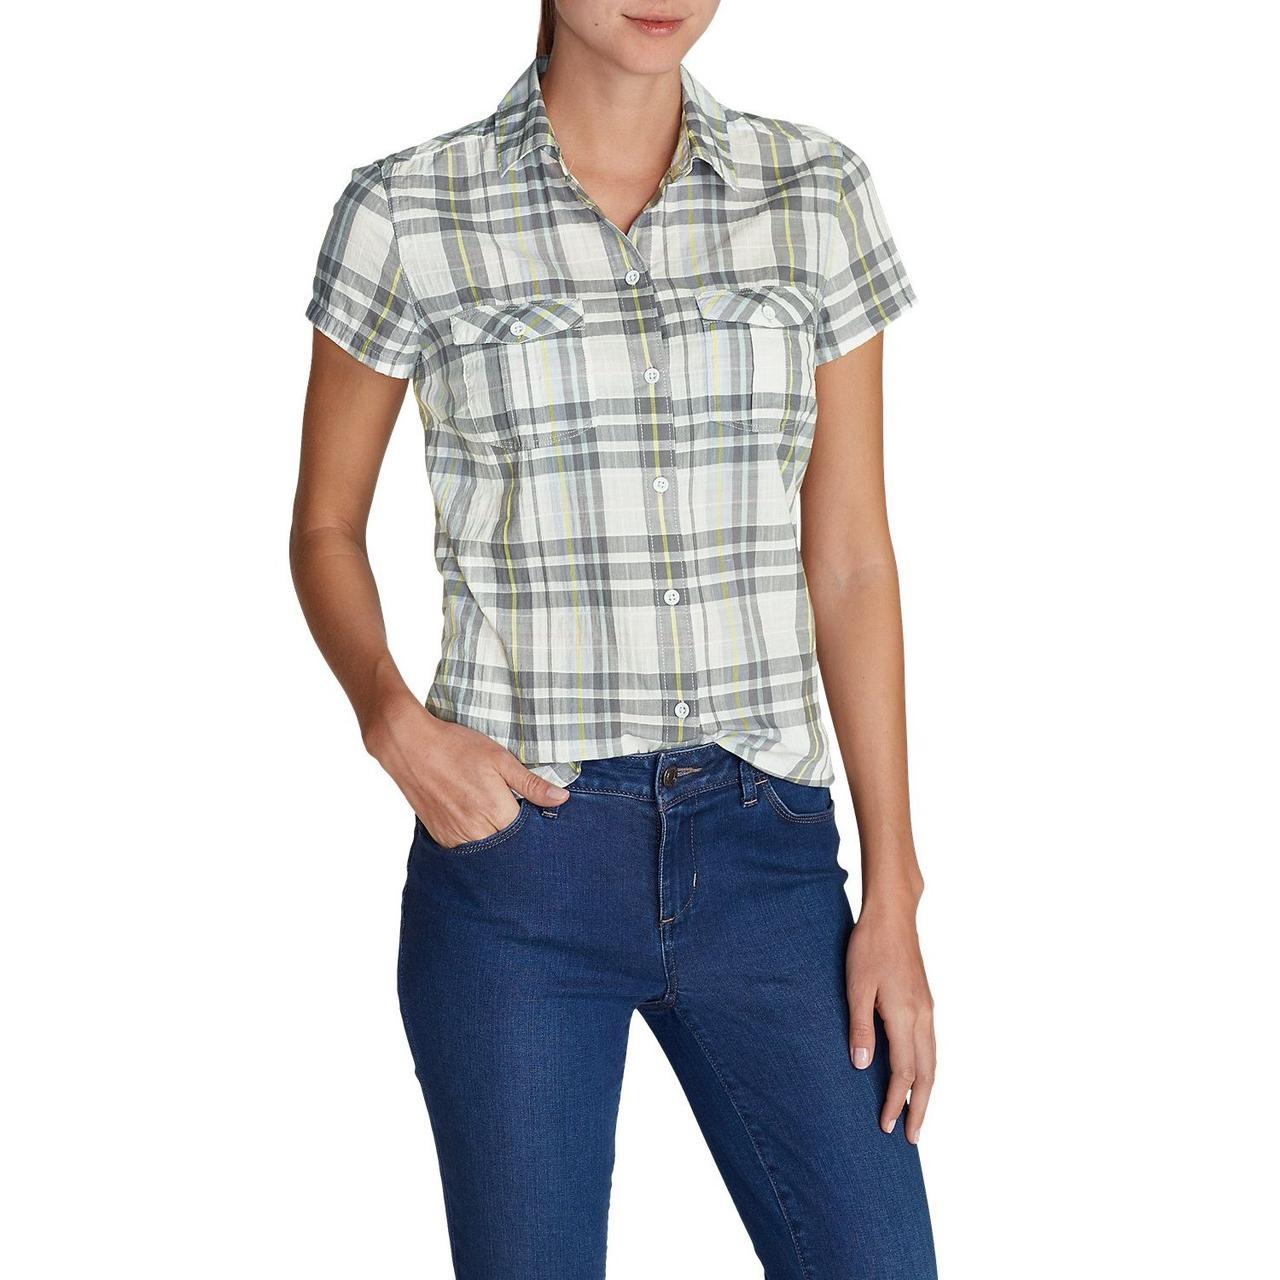 Блузка Eddie Bauer Womens Packable Short-Sleeve Shirt SPRIG (XS)